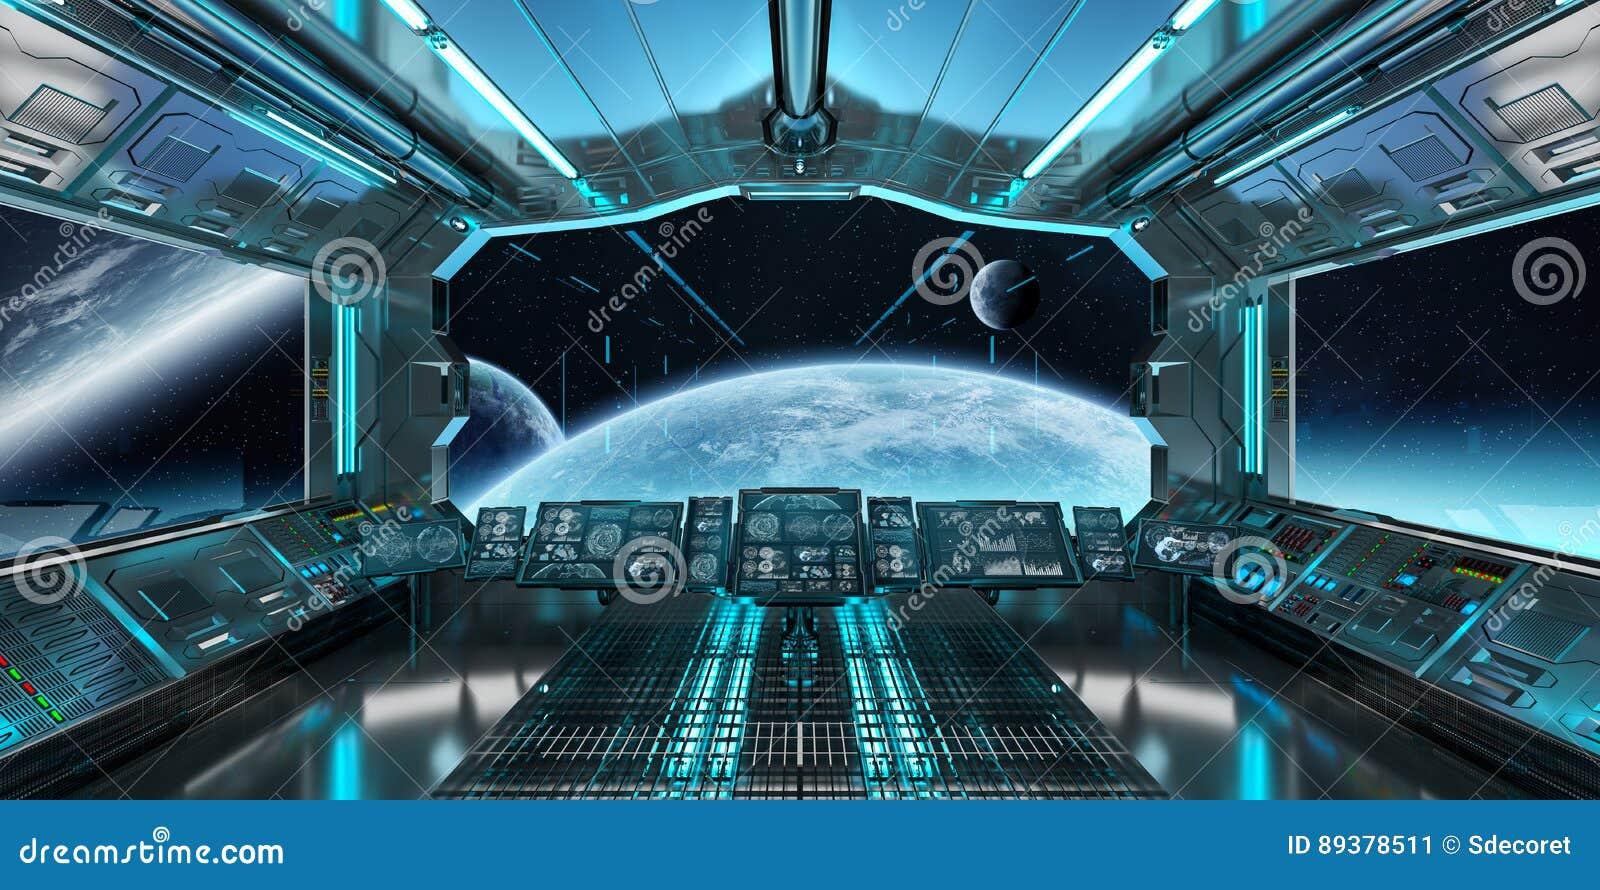 space shuttle interior 3d scan - photo #47